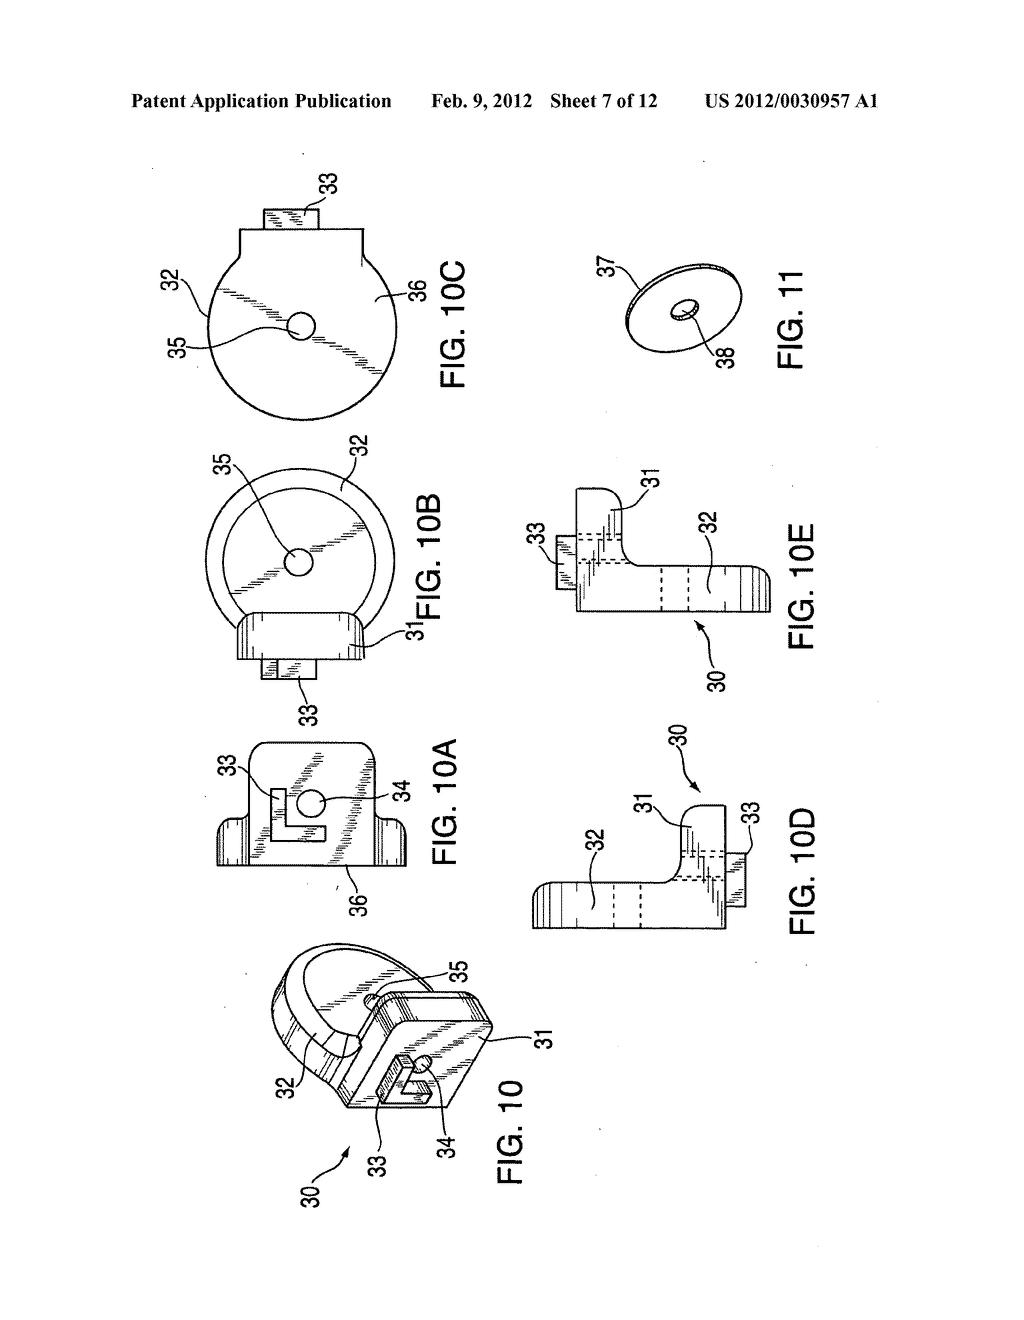 Ergonomic Vernier Caliper Base Diagram Schematic And Image 08